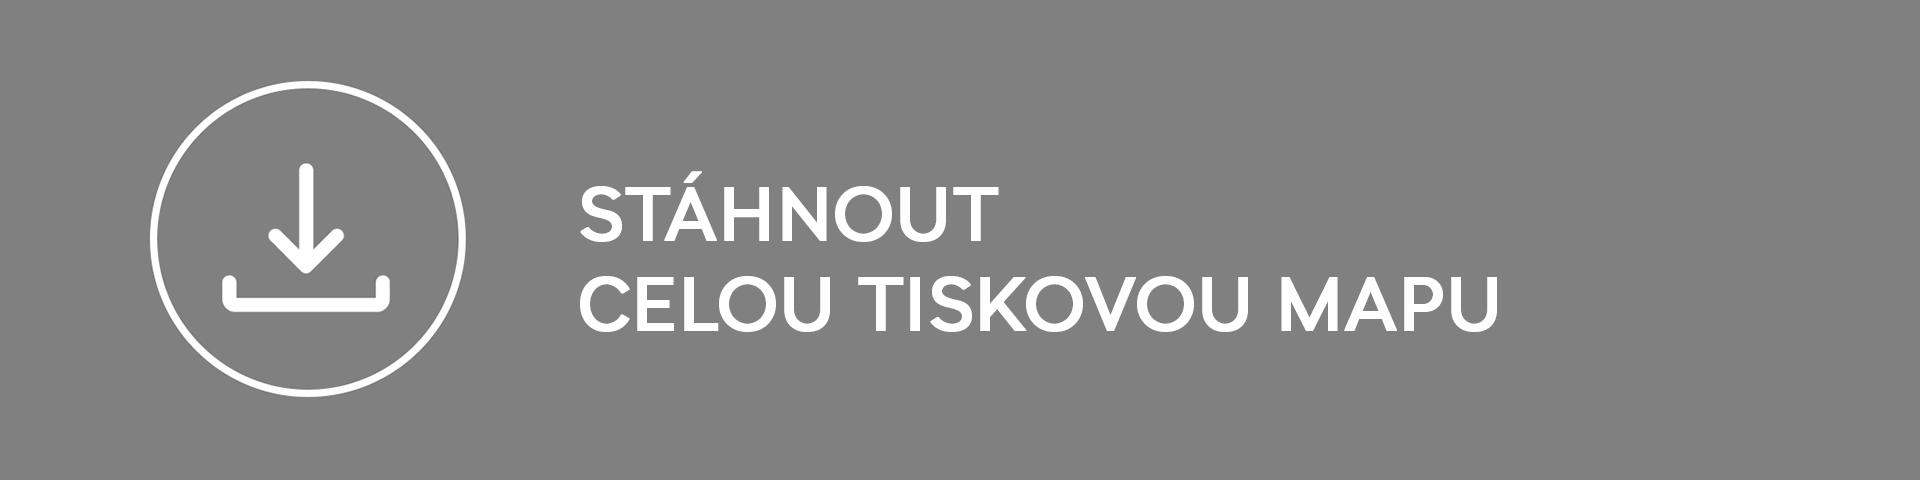 13_download_cz